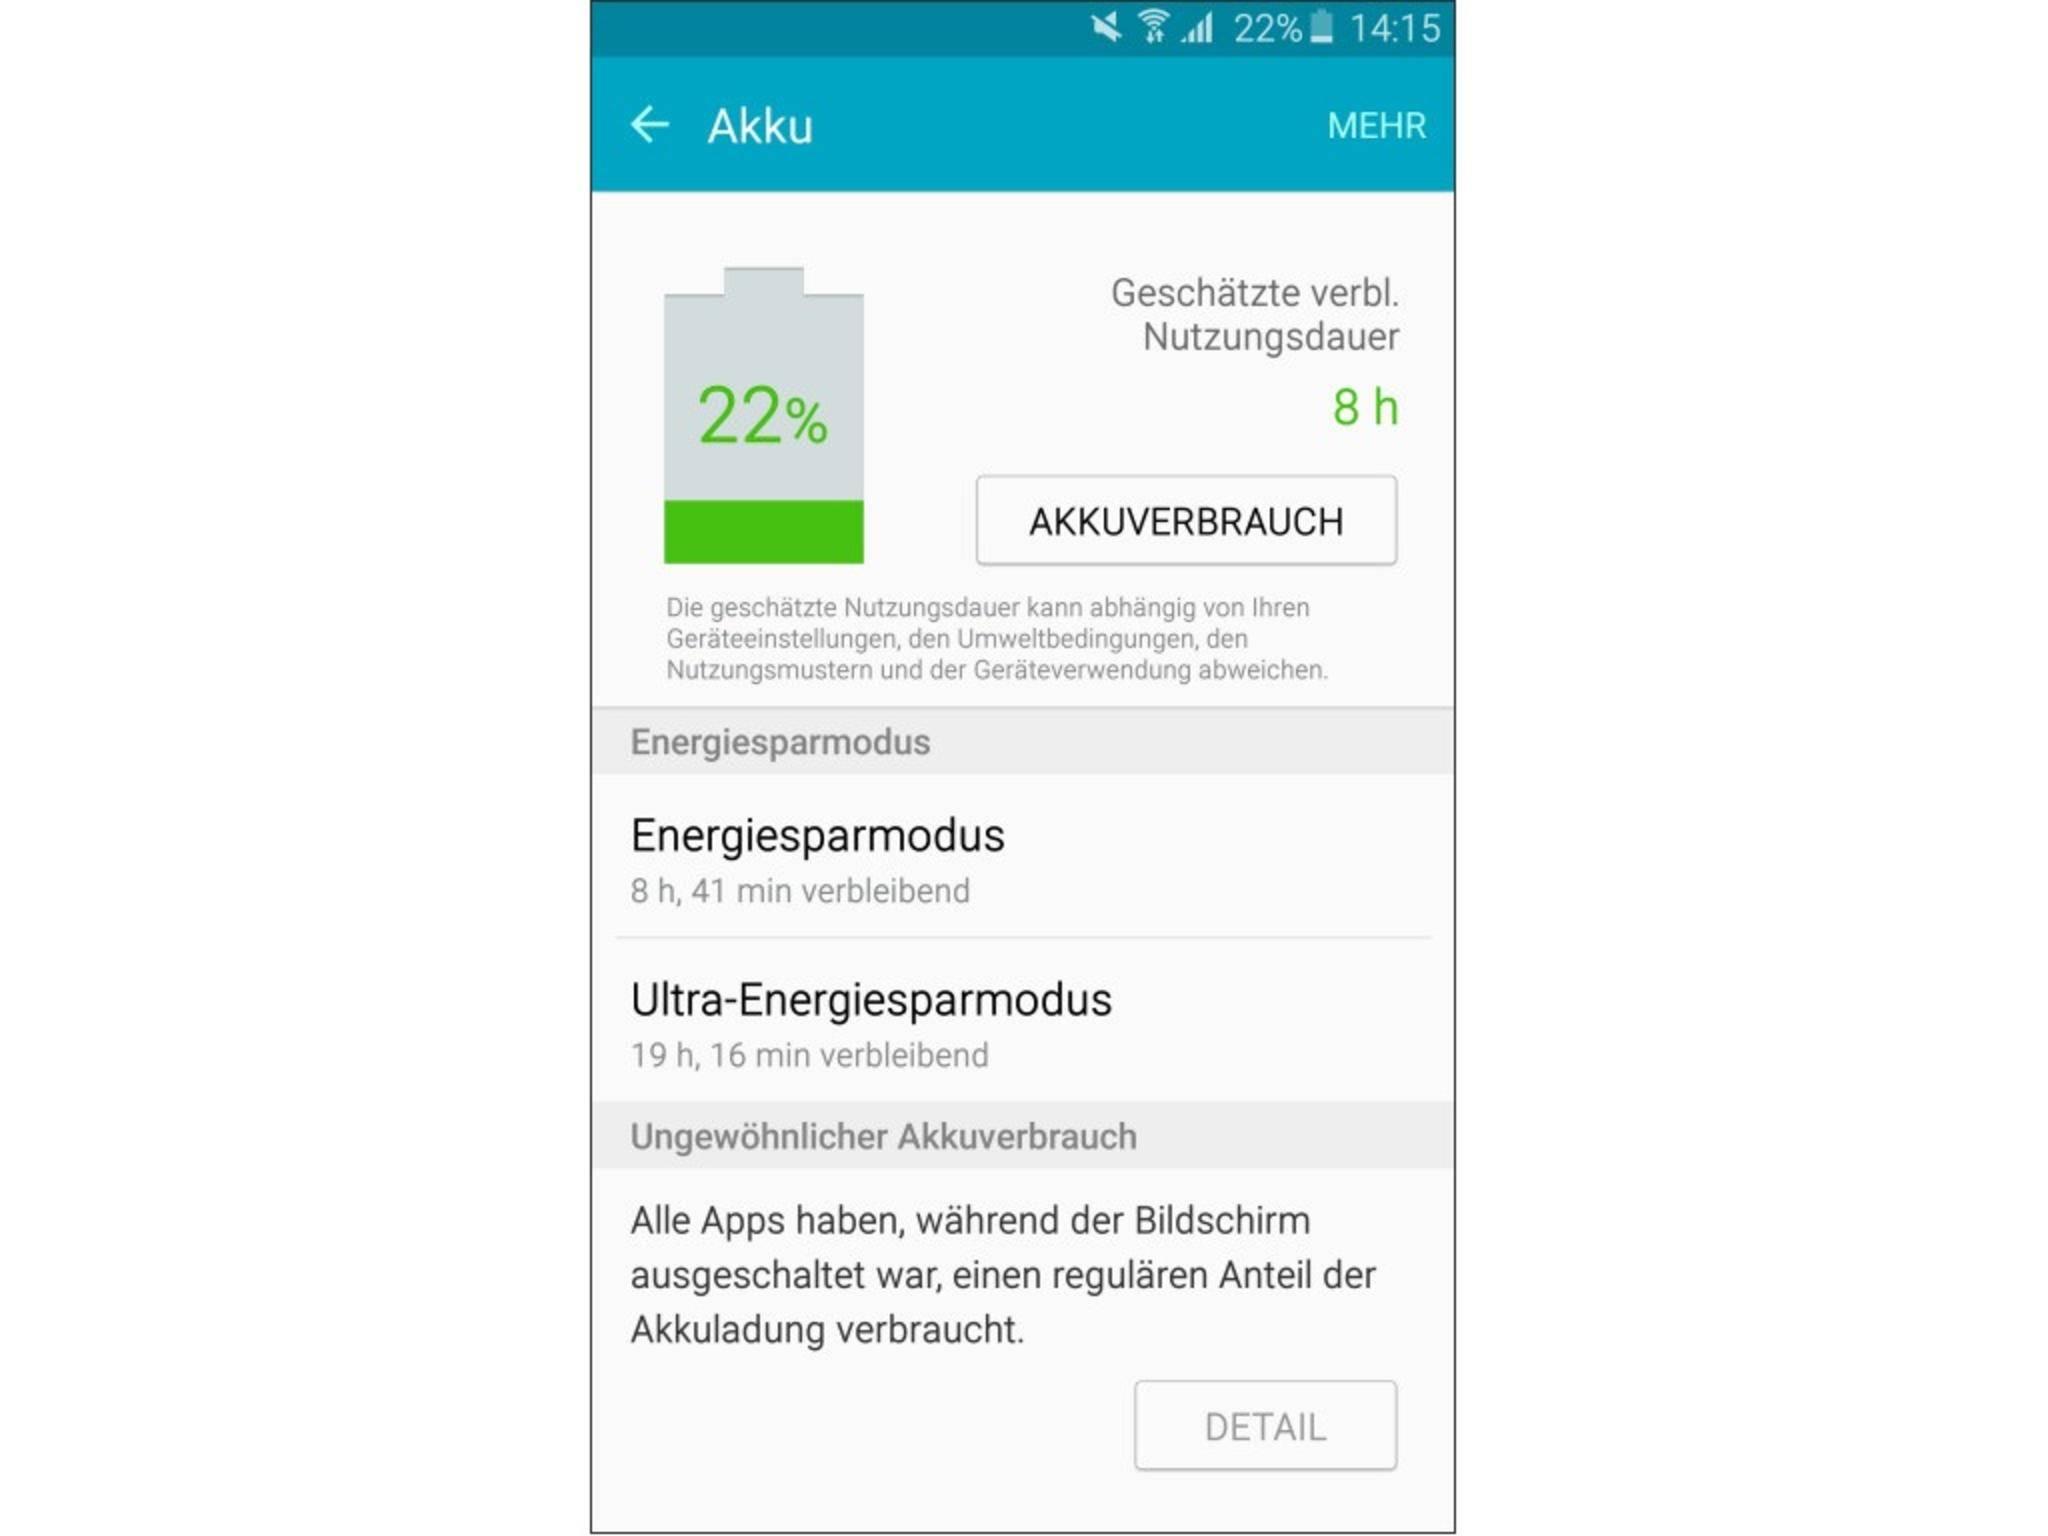 Galaxy S6 Screenshot 44